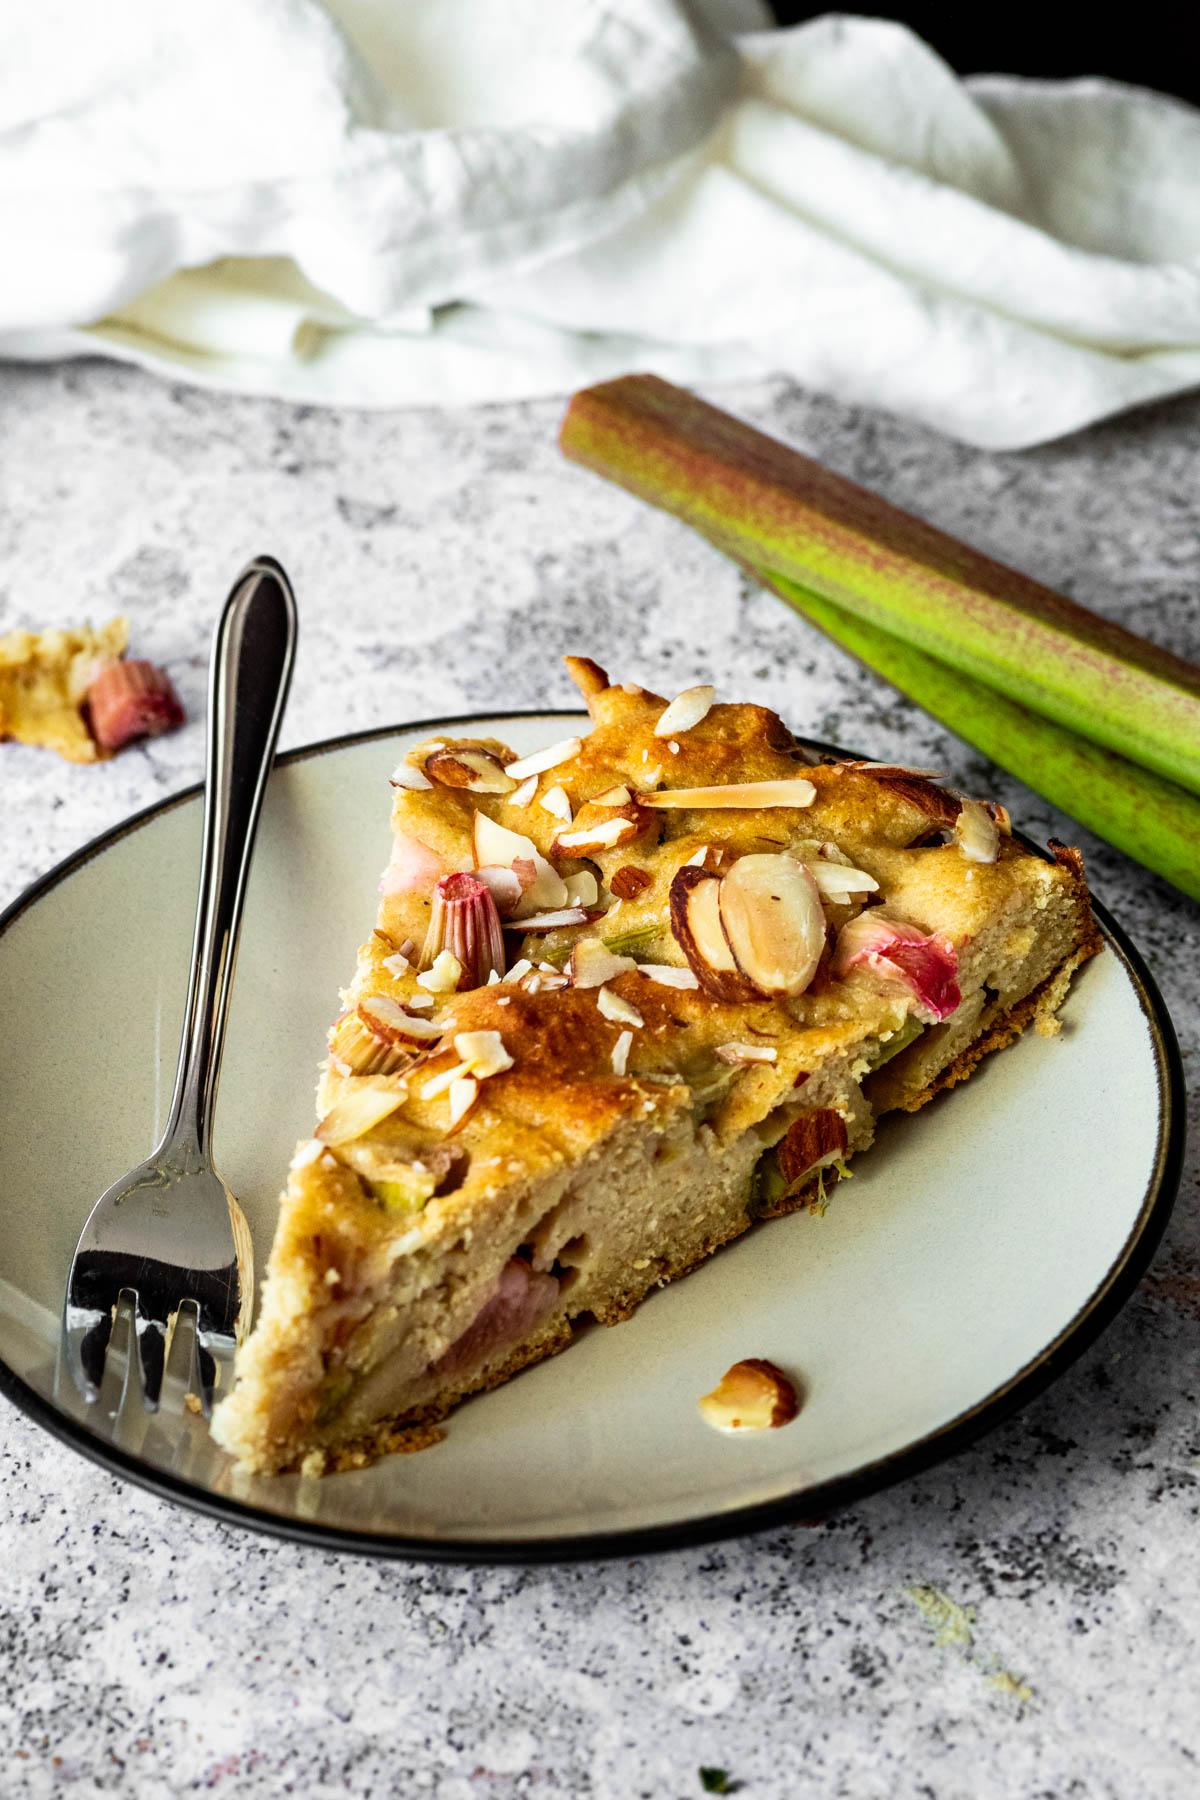 one vegan rhubarb cake slice on a plate